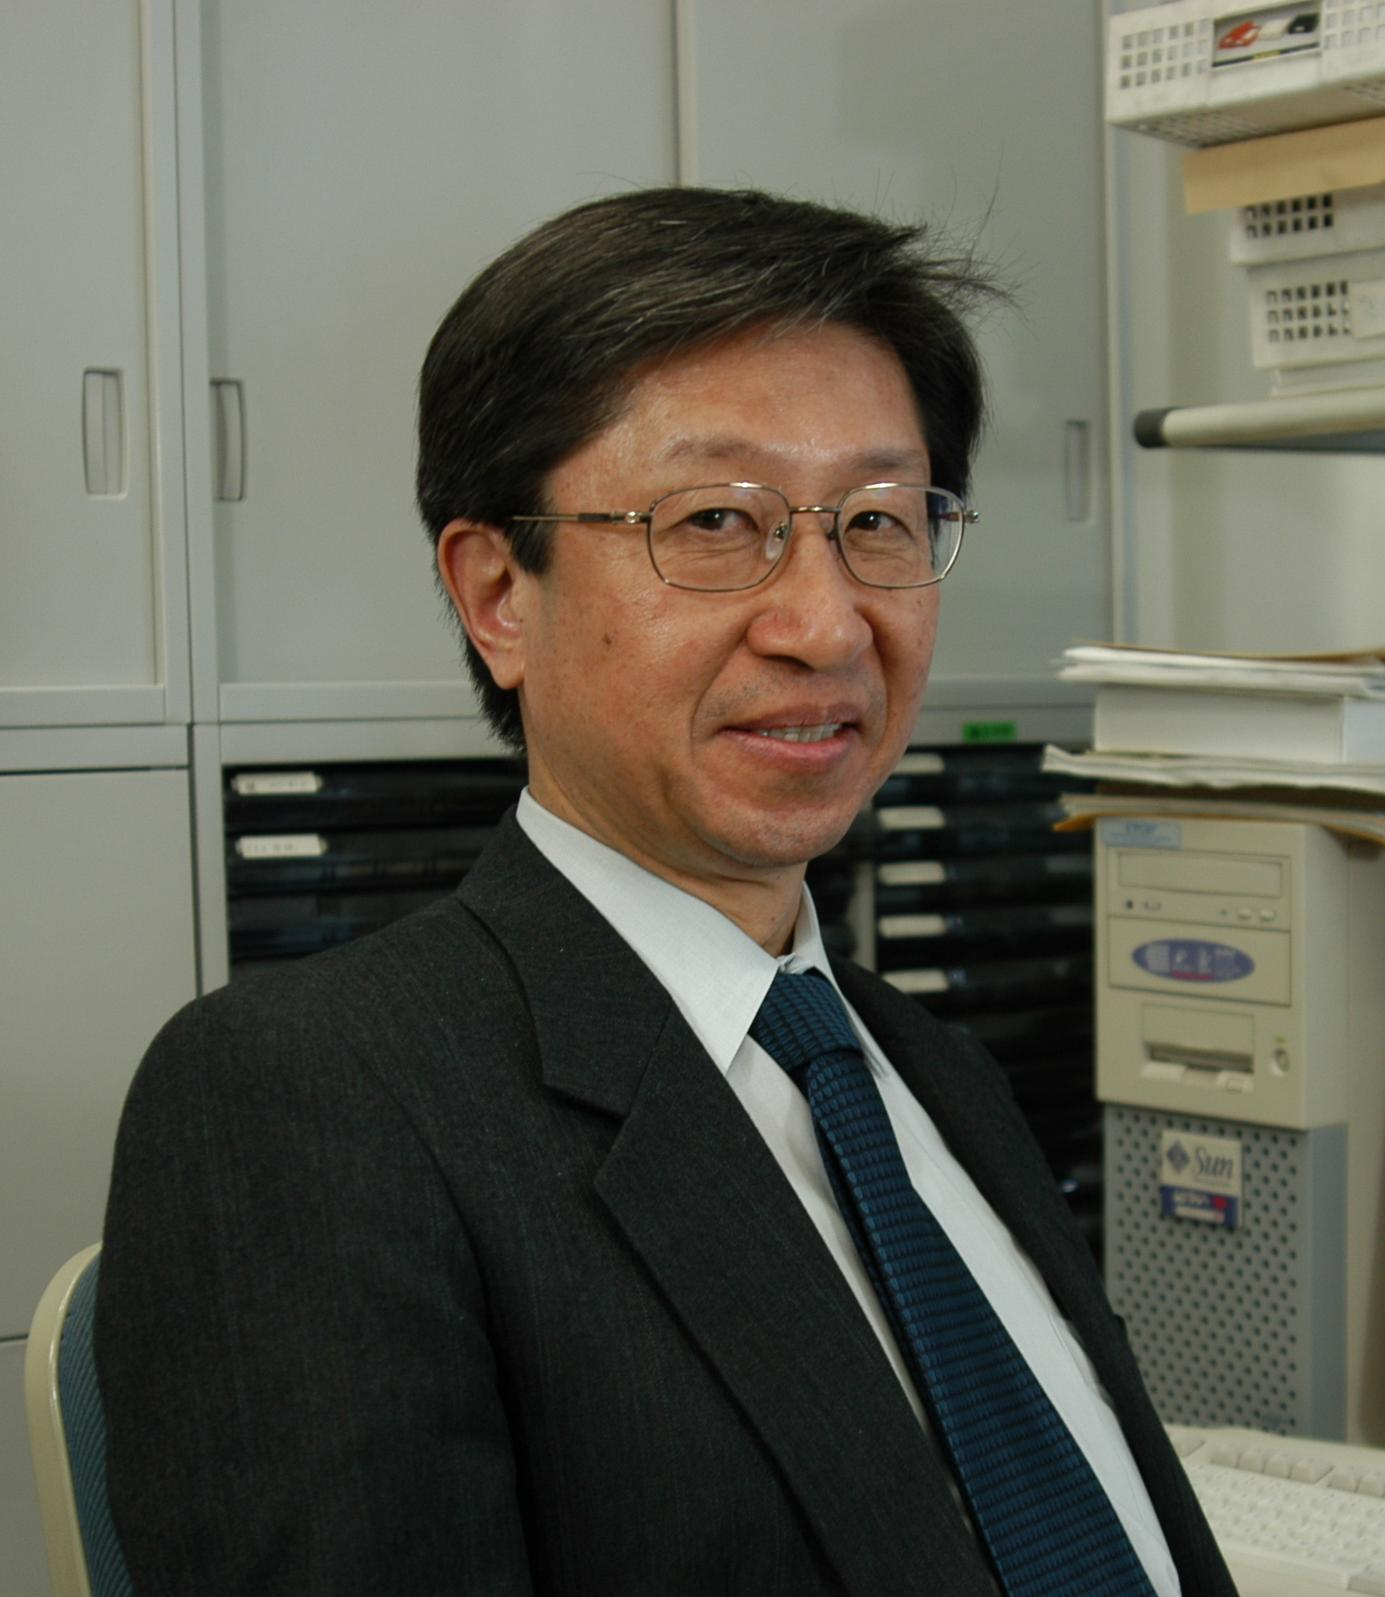 Kokichi Sugihara pencipta ilusi optik ambiguous cylinders